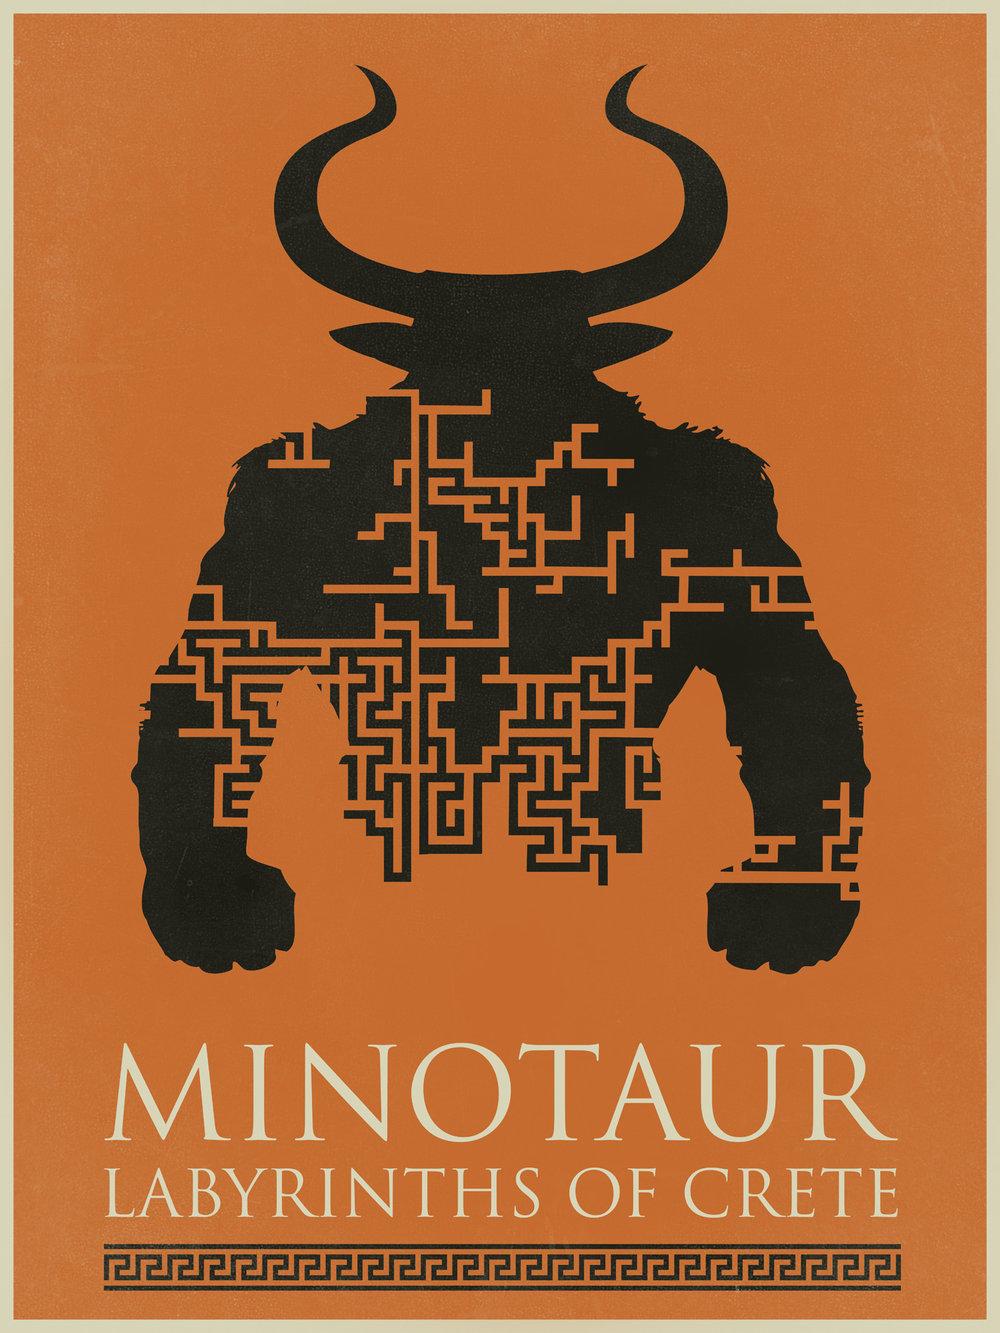 Minotaur_poster.jpg